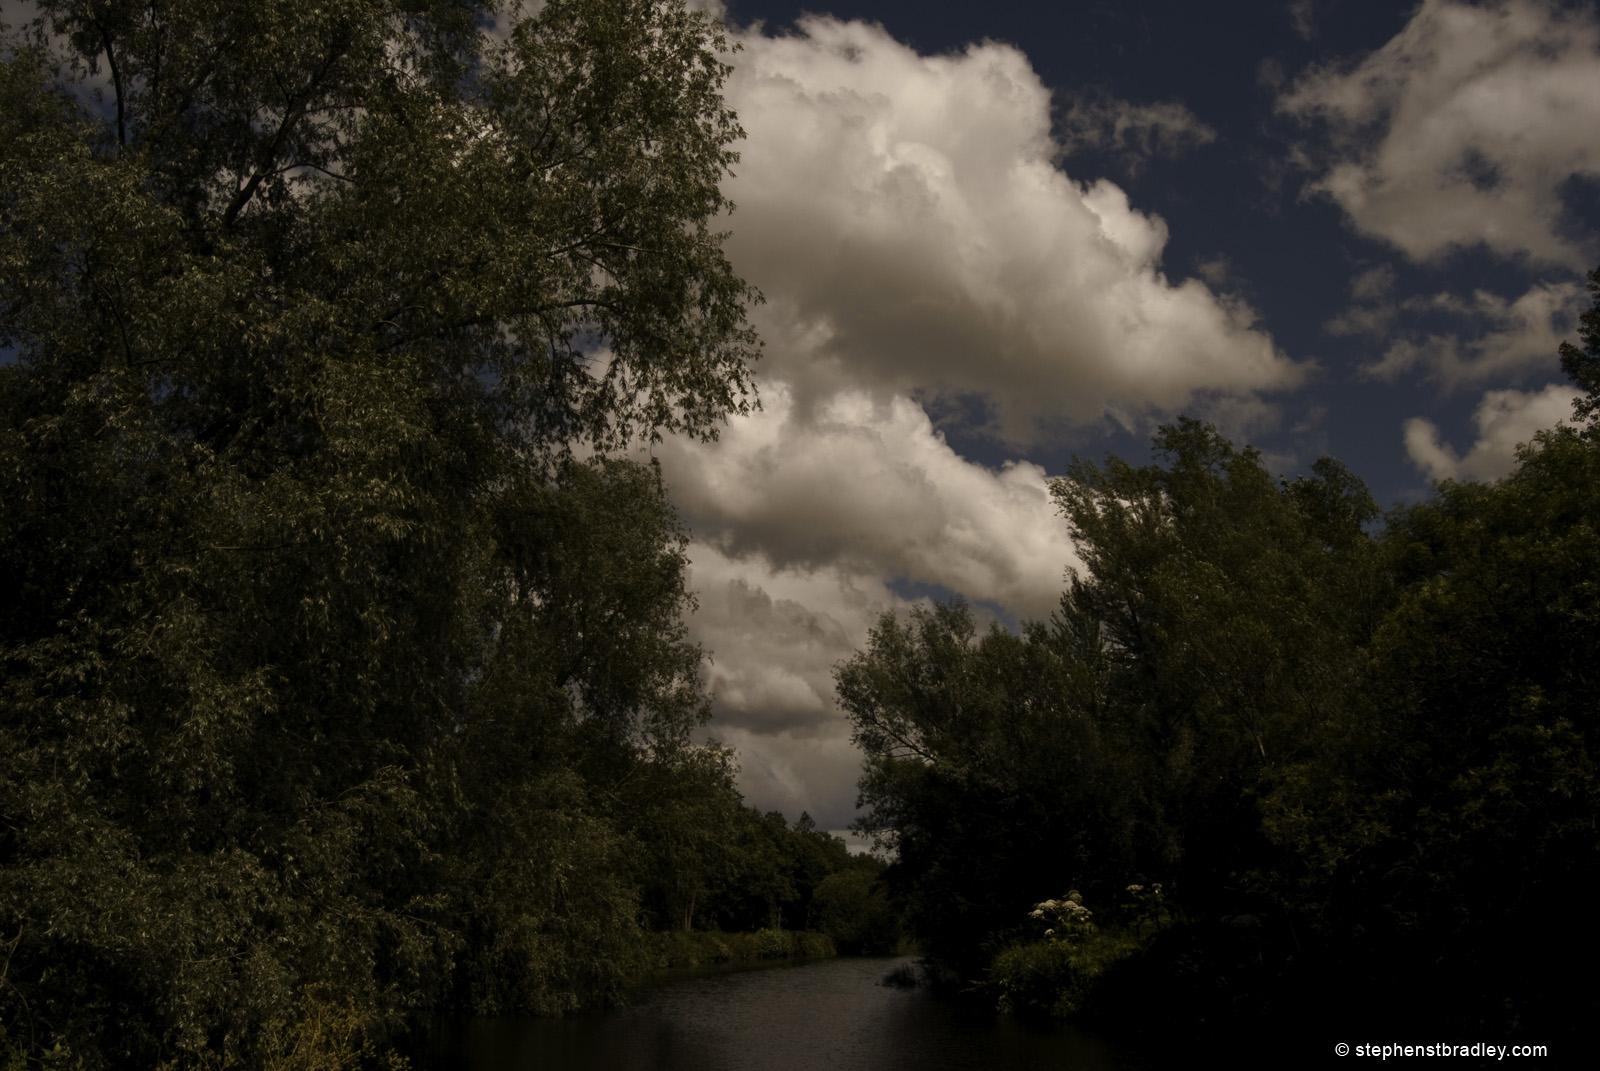 River Lagan Tow Path, Belfast, Northern Ireland. Fine art landscape photograph 2889.